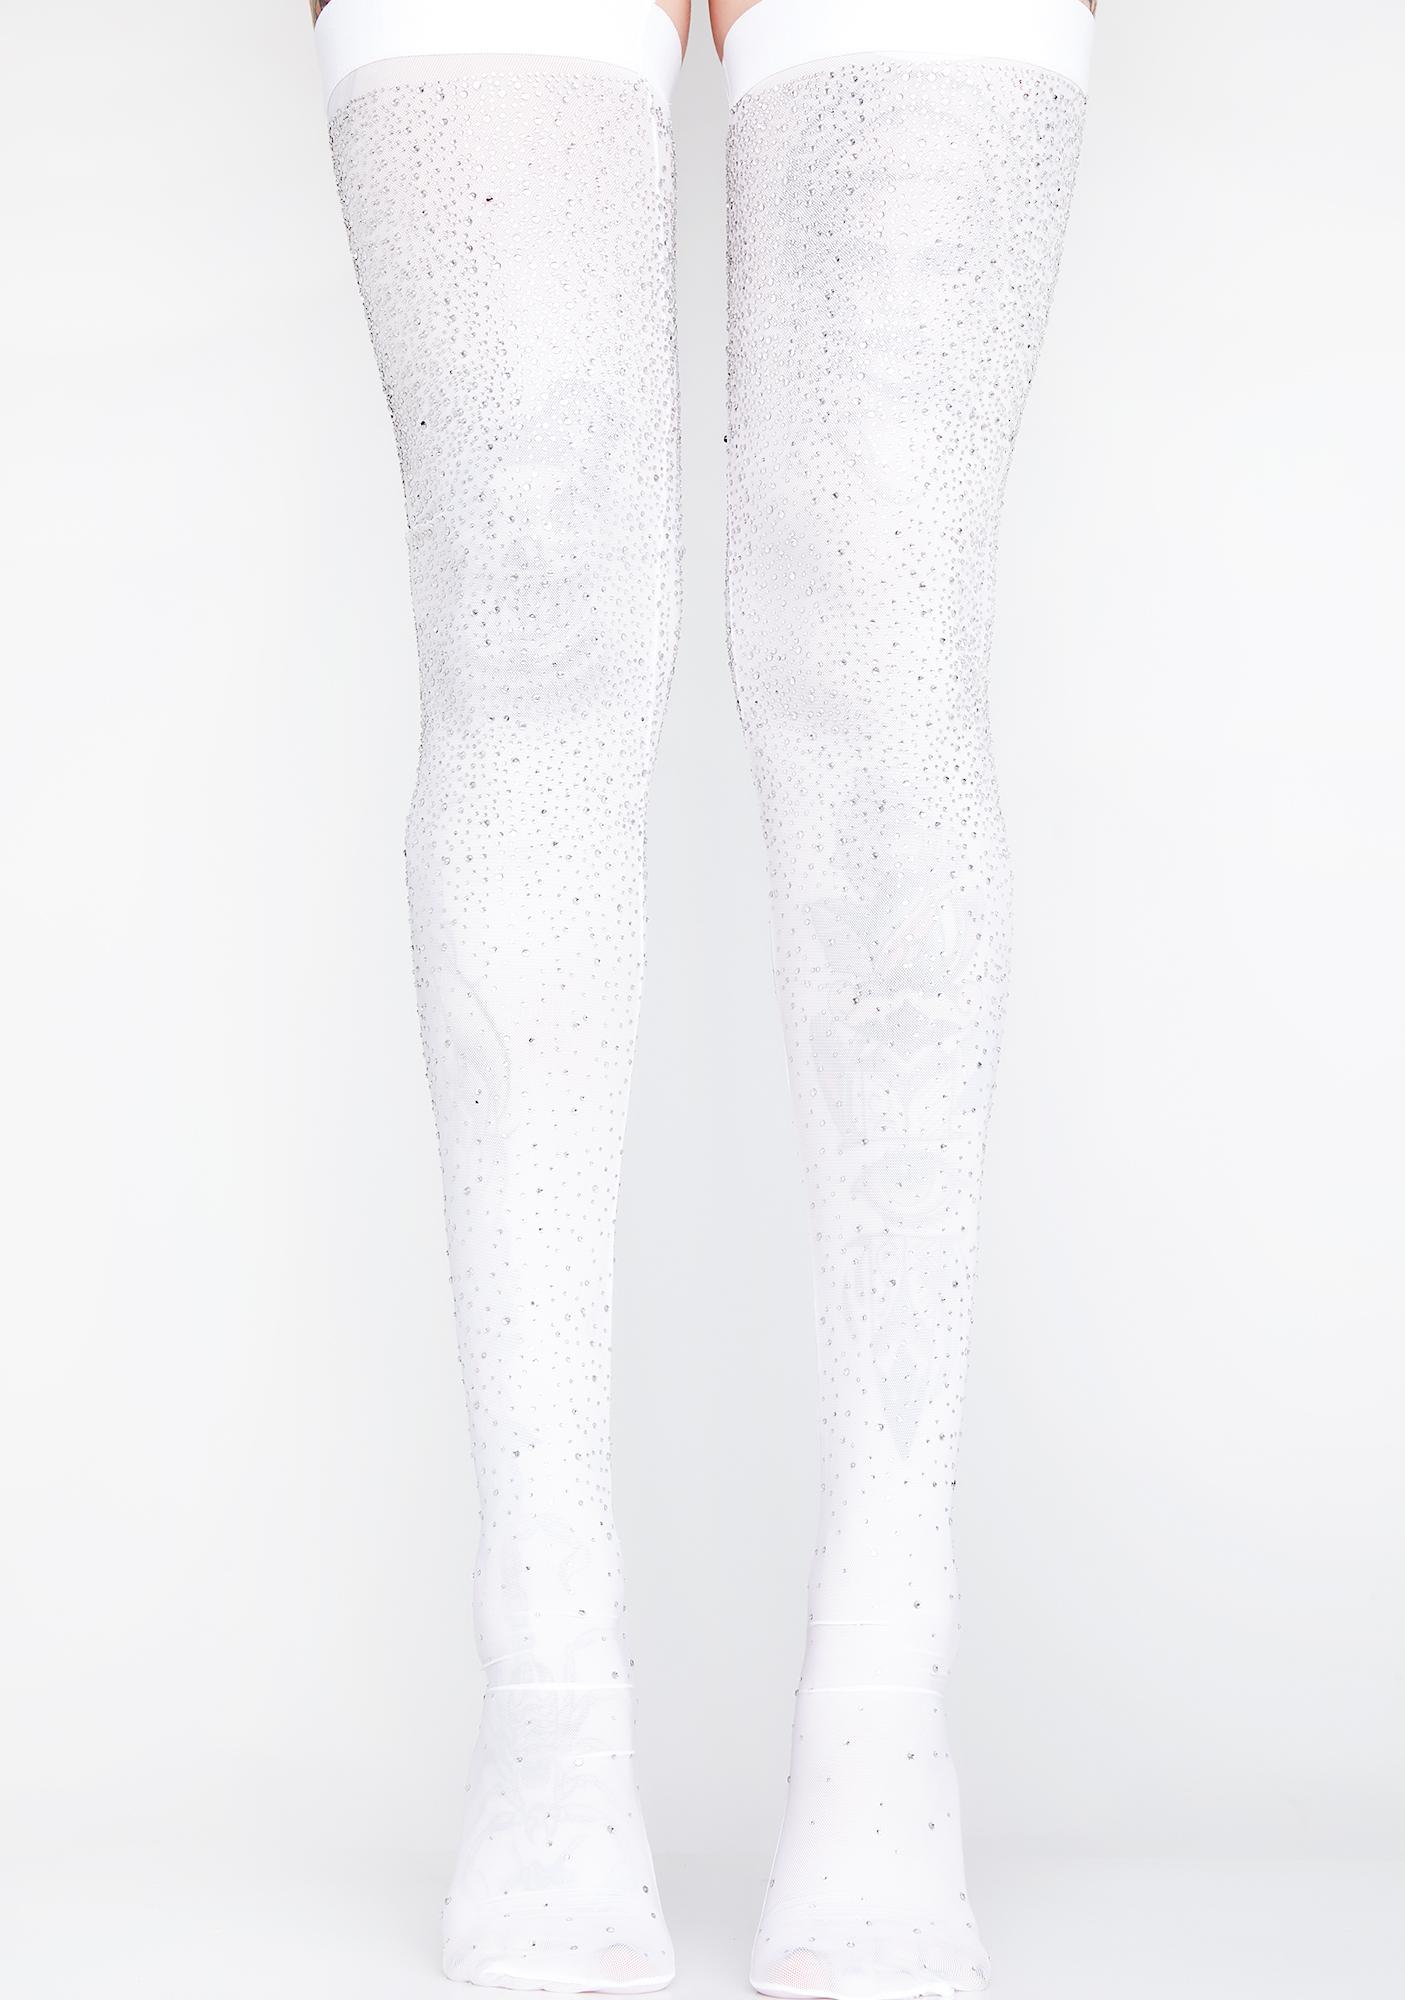 b06807831 White Silver Rhinestone Sheer Thigh Highs